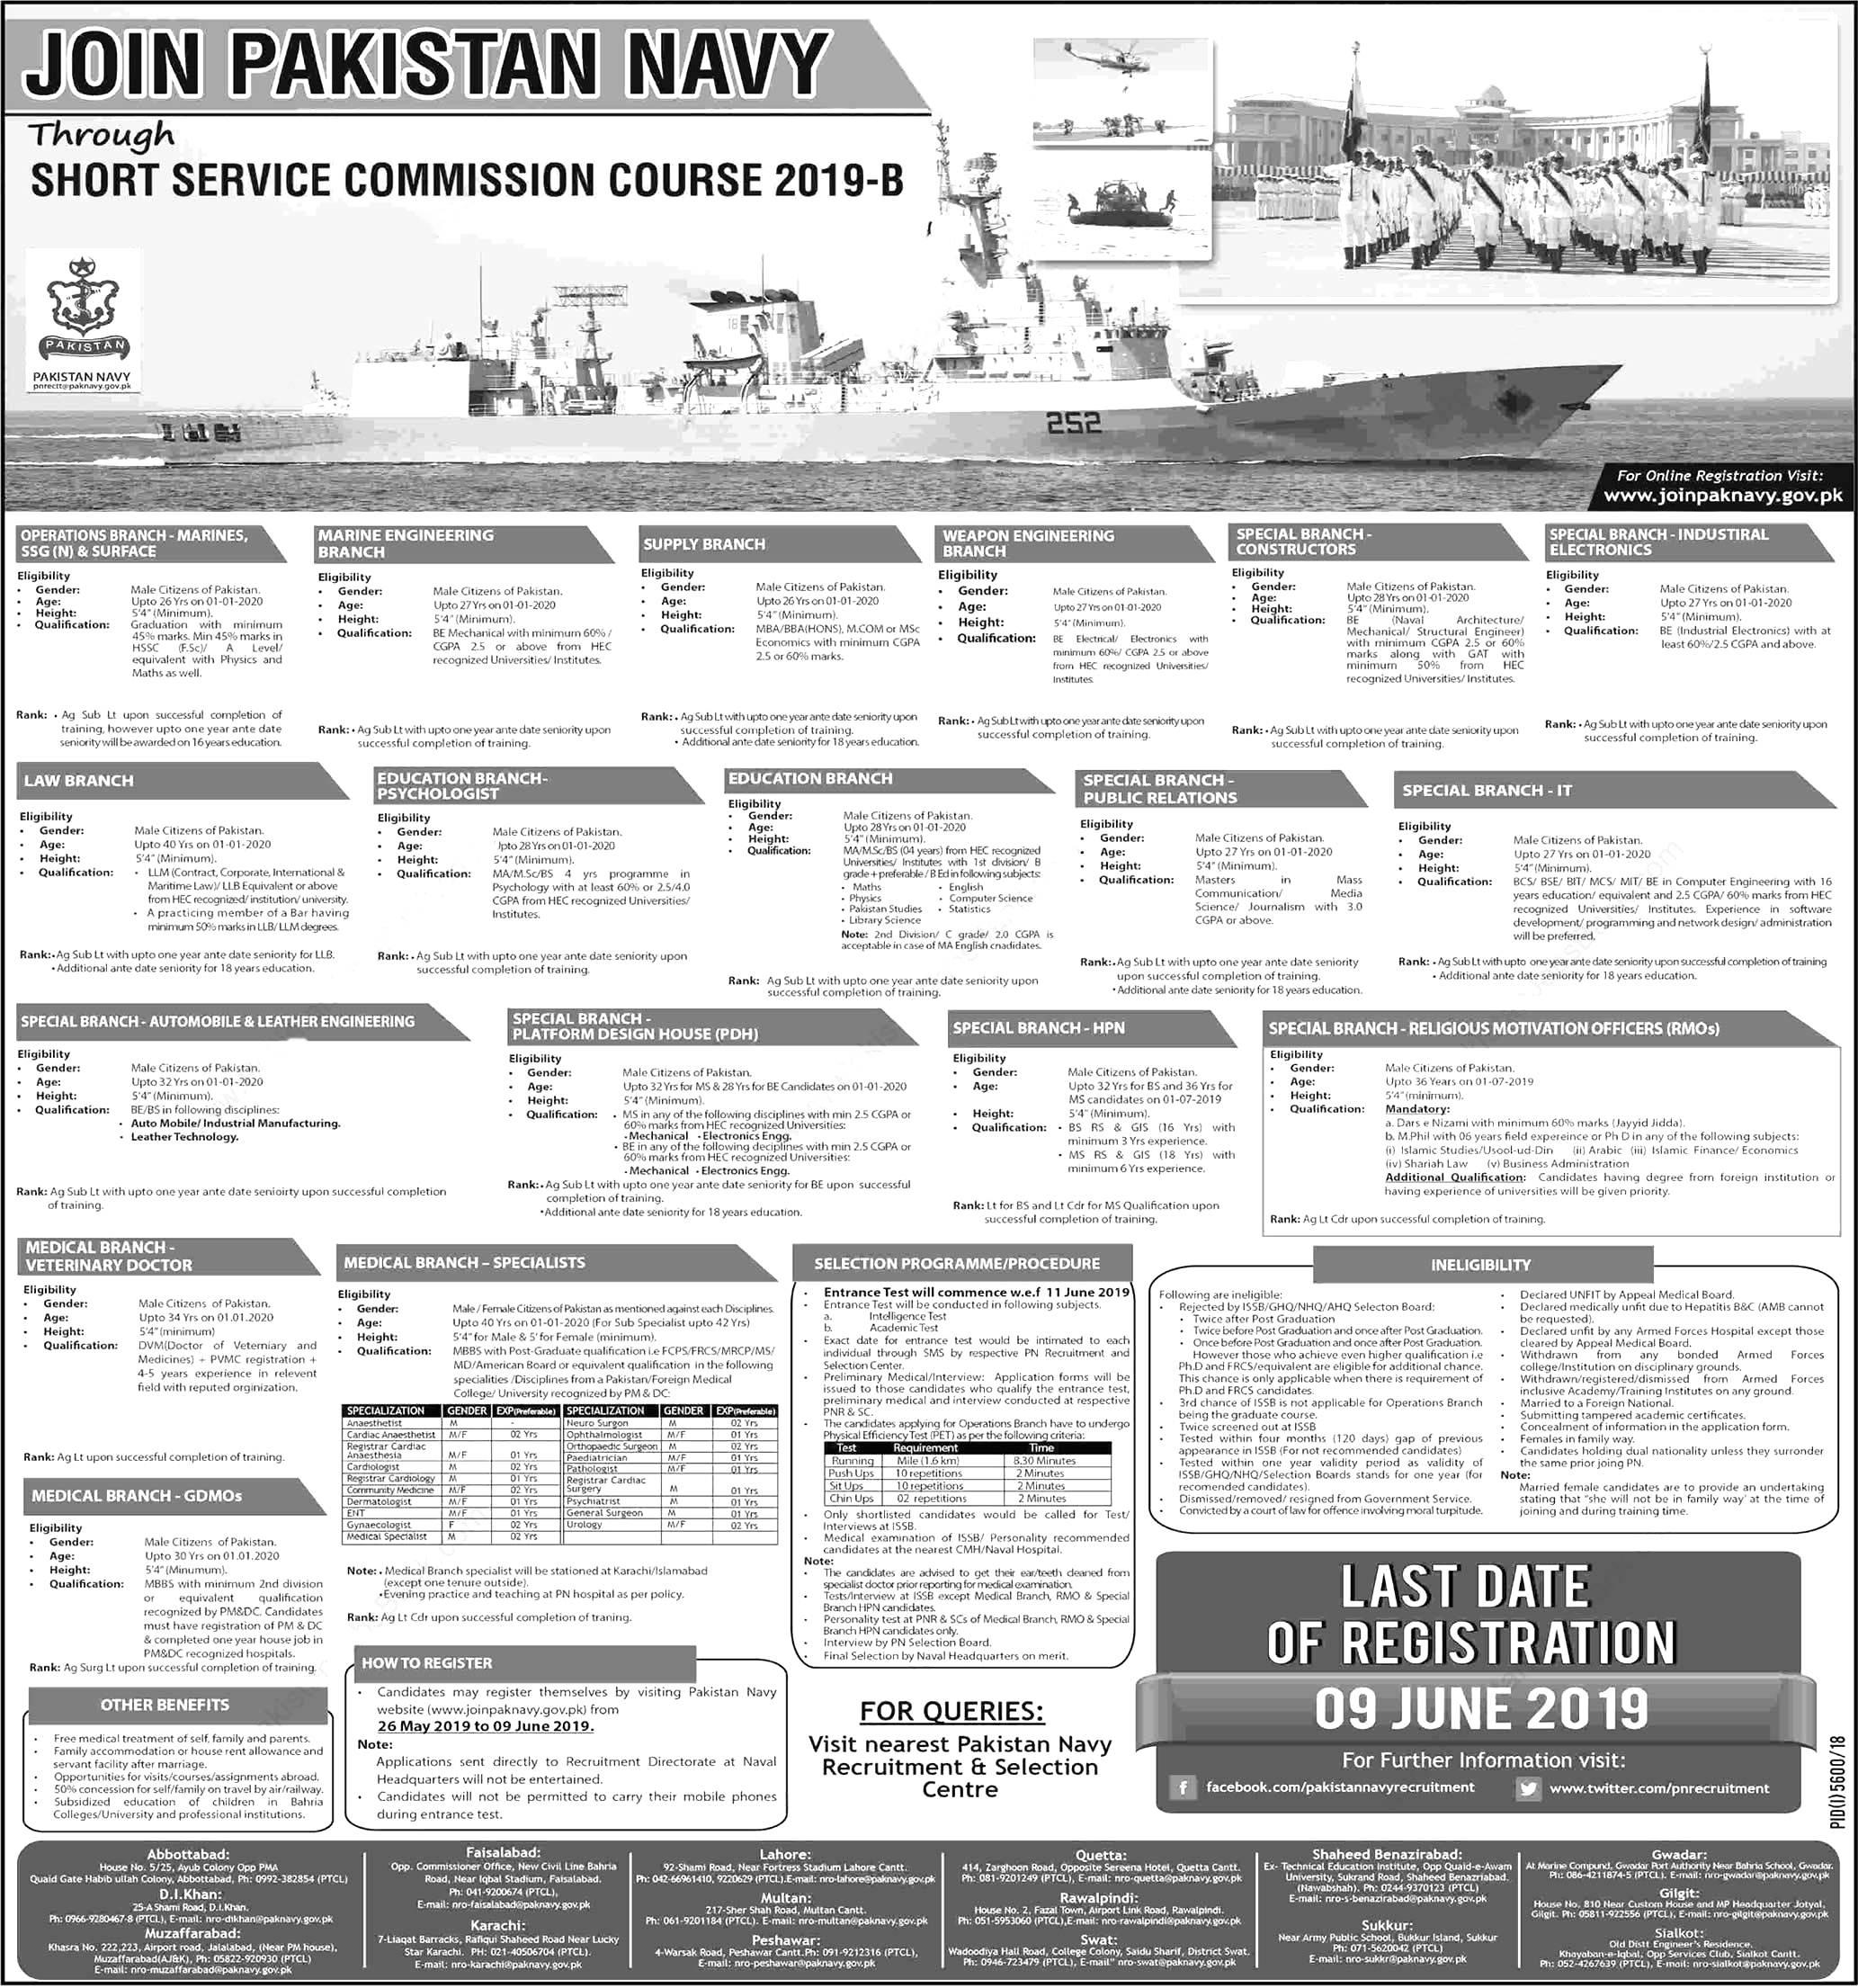 Join Pak Navy Jobs 2019 Batch-B Short Service Commission